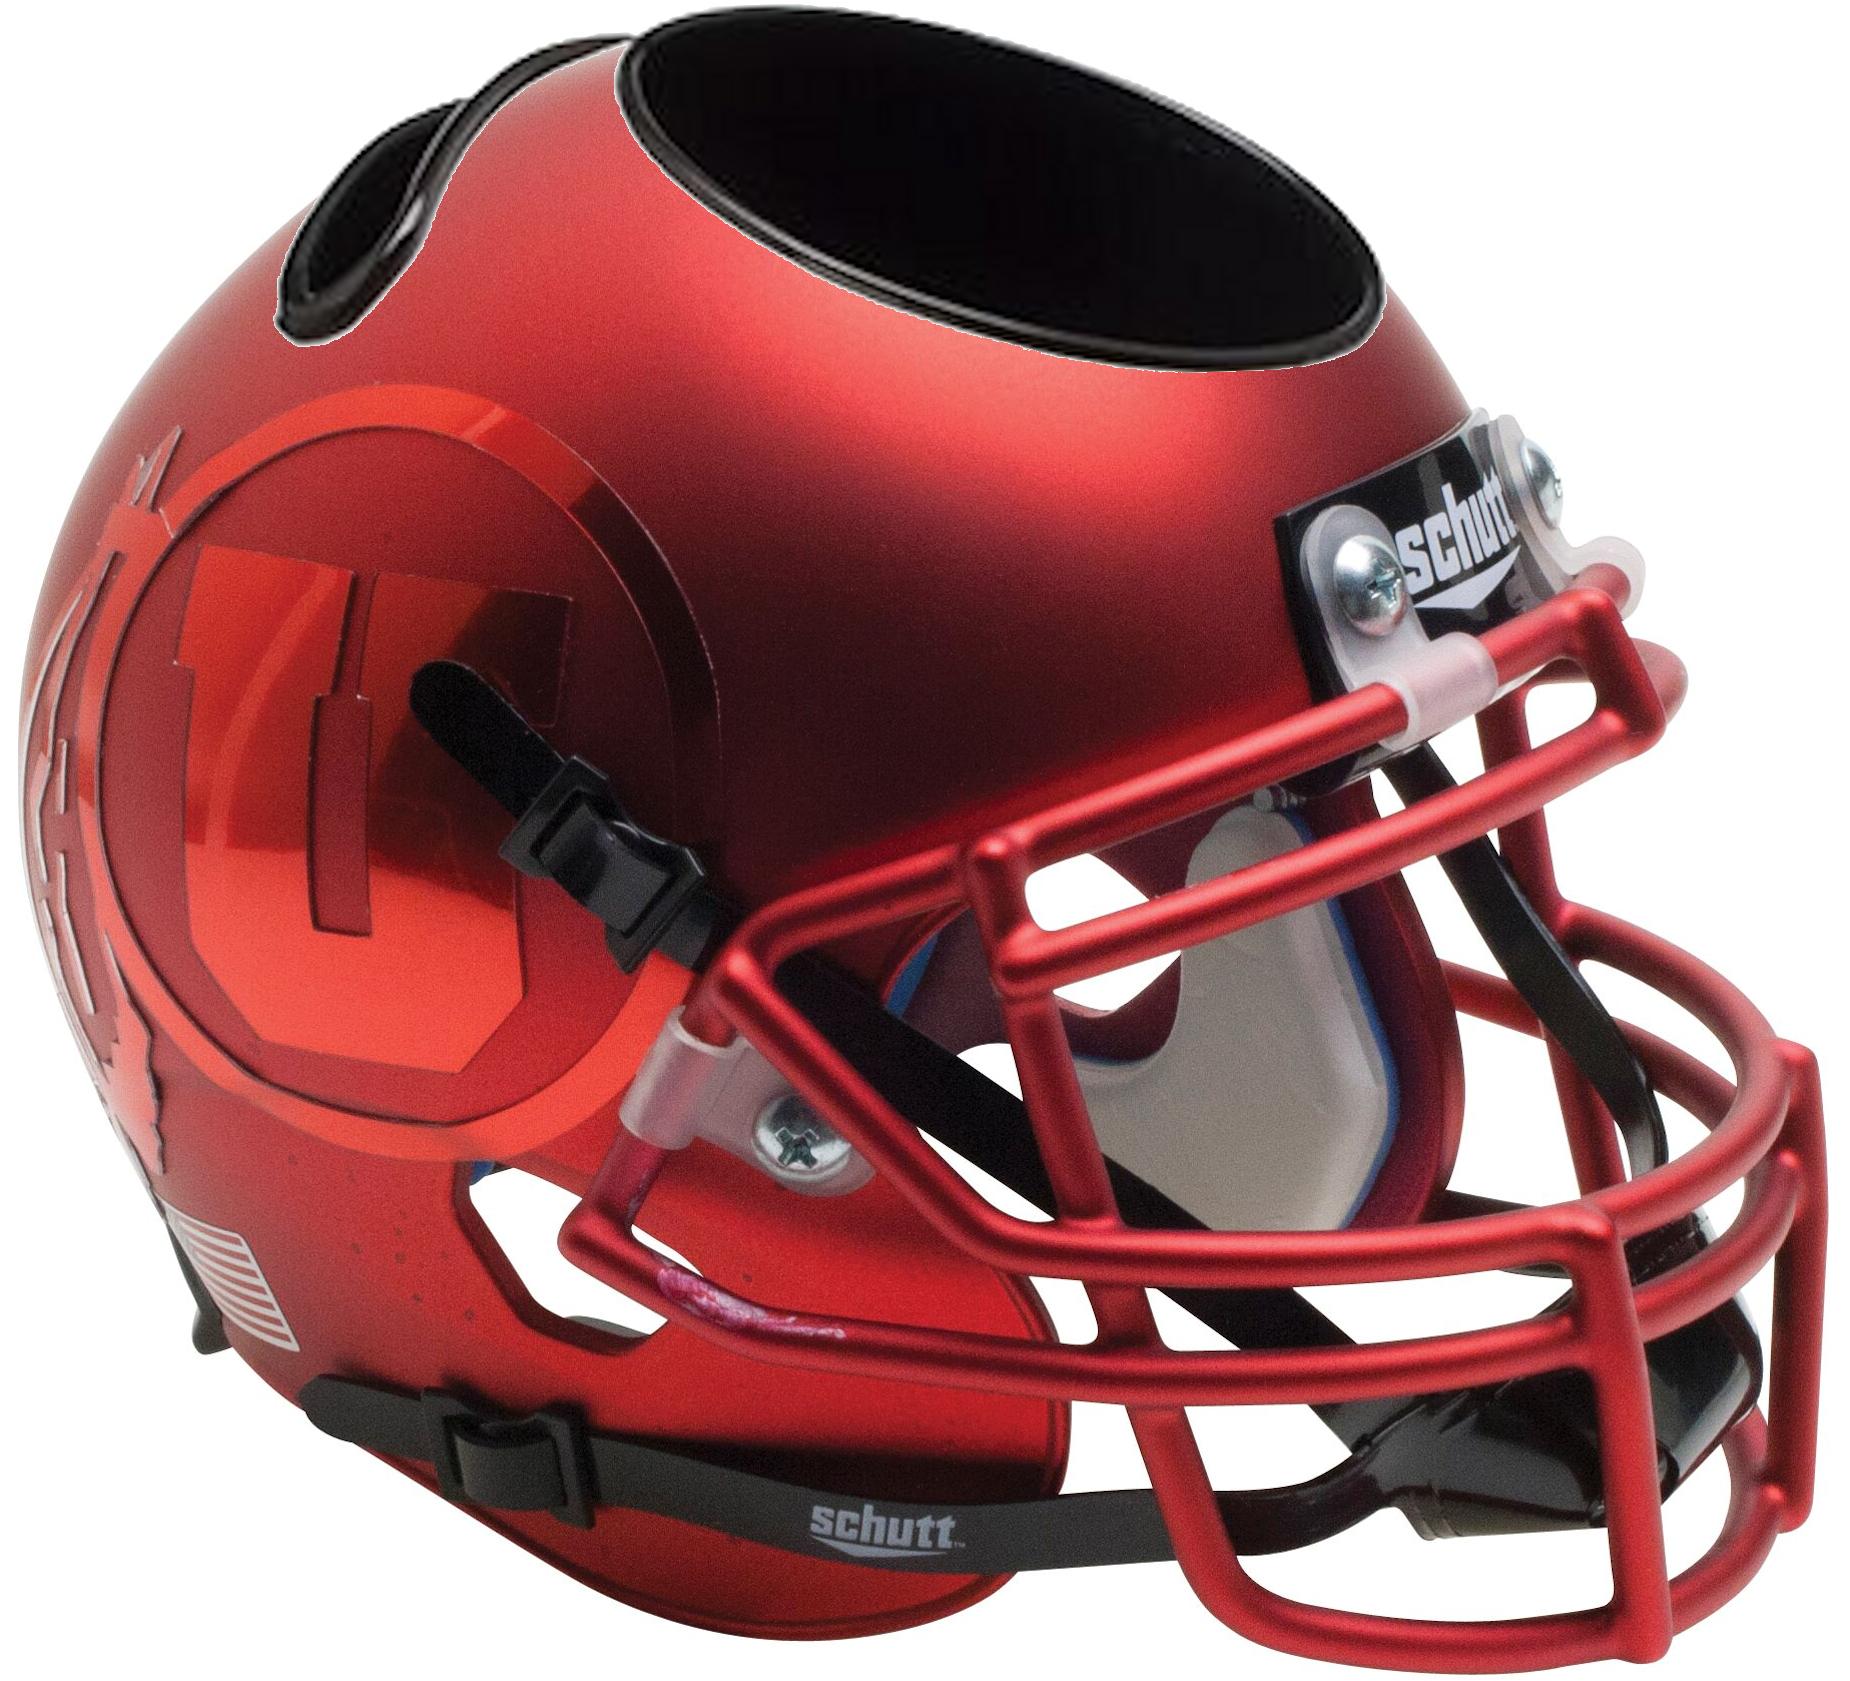 Utah Utes Miniature Football Helmet Desk Caddy <B>Satin Red Chrome Decal</B>